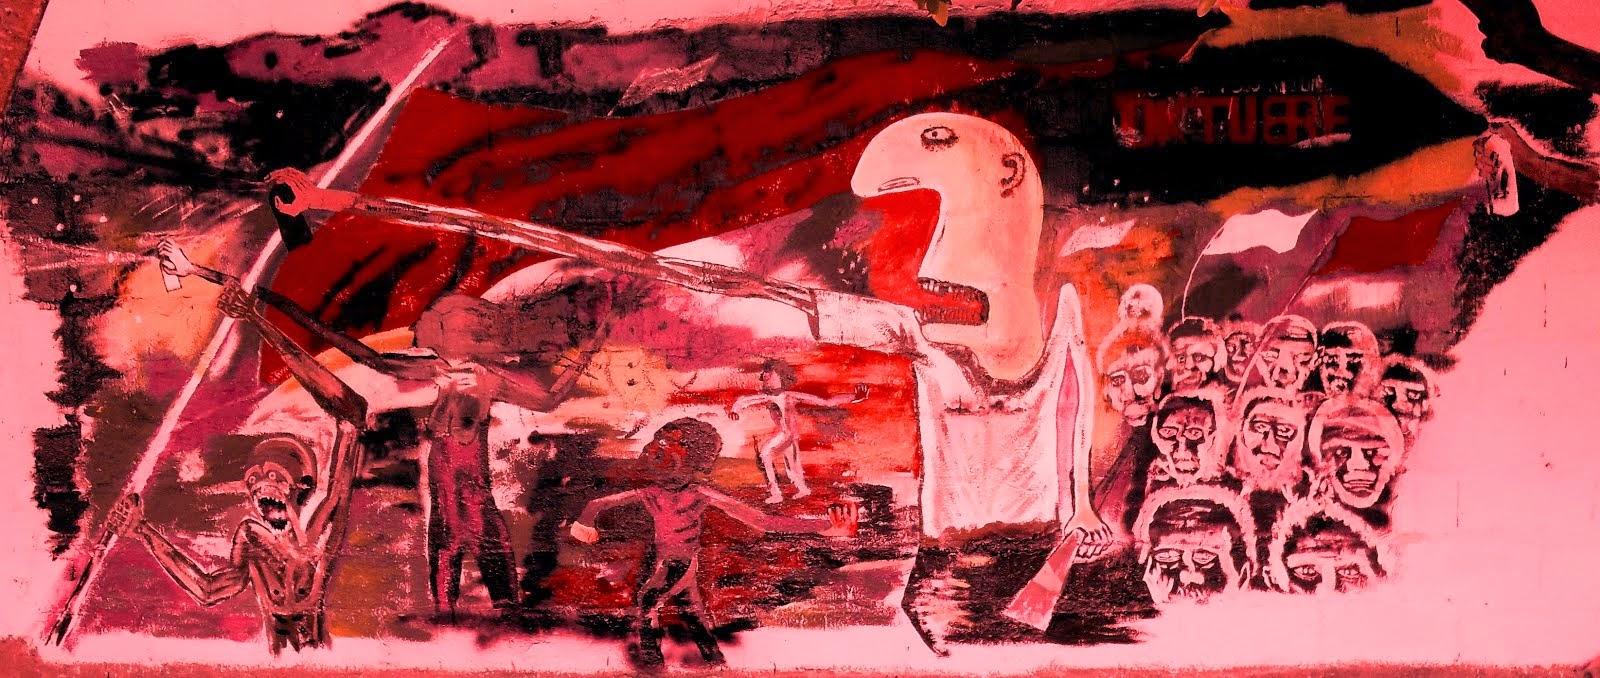 Artes muralismo